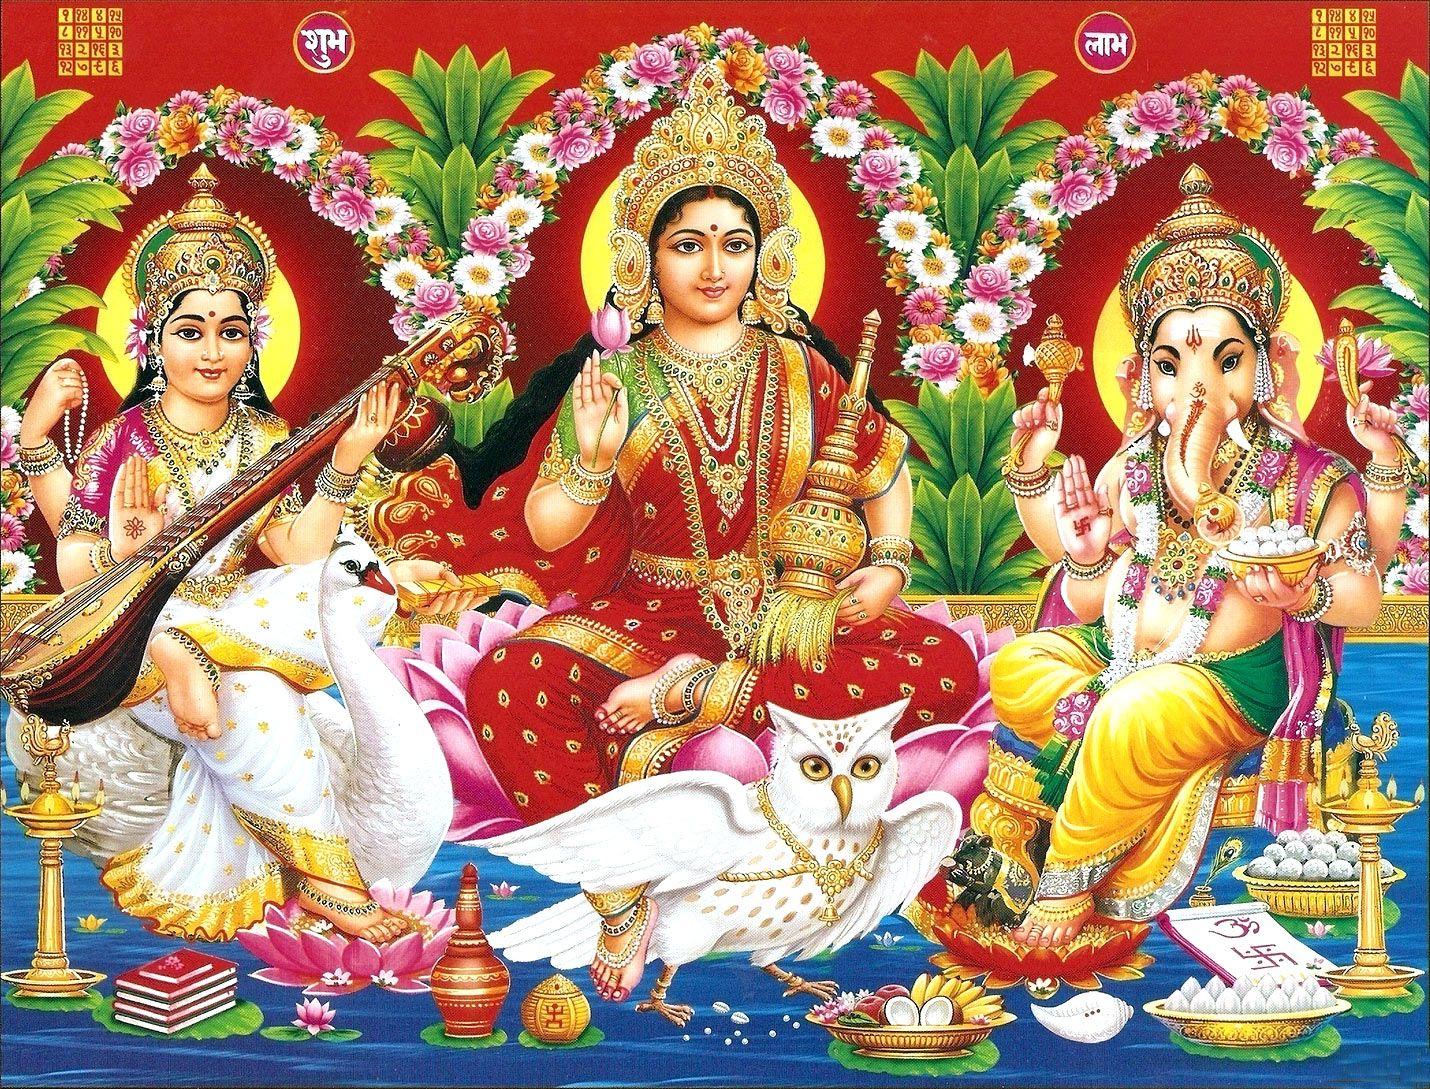 Laxmi Ganesh Saraswati Wallpaper HD Full Size Download